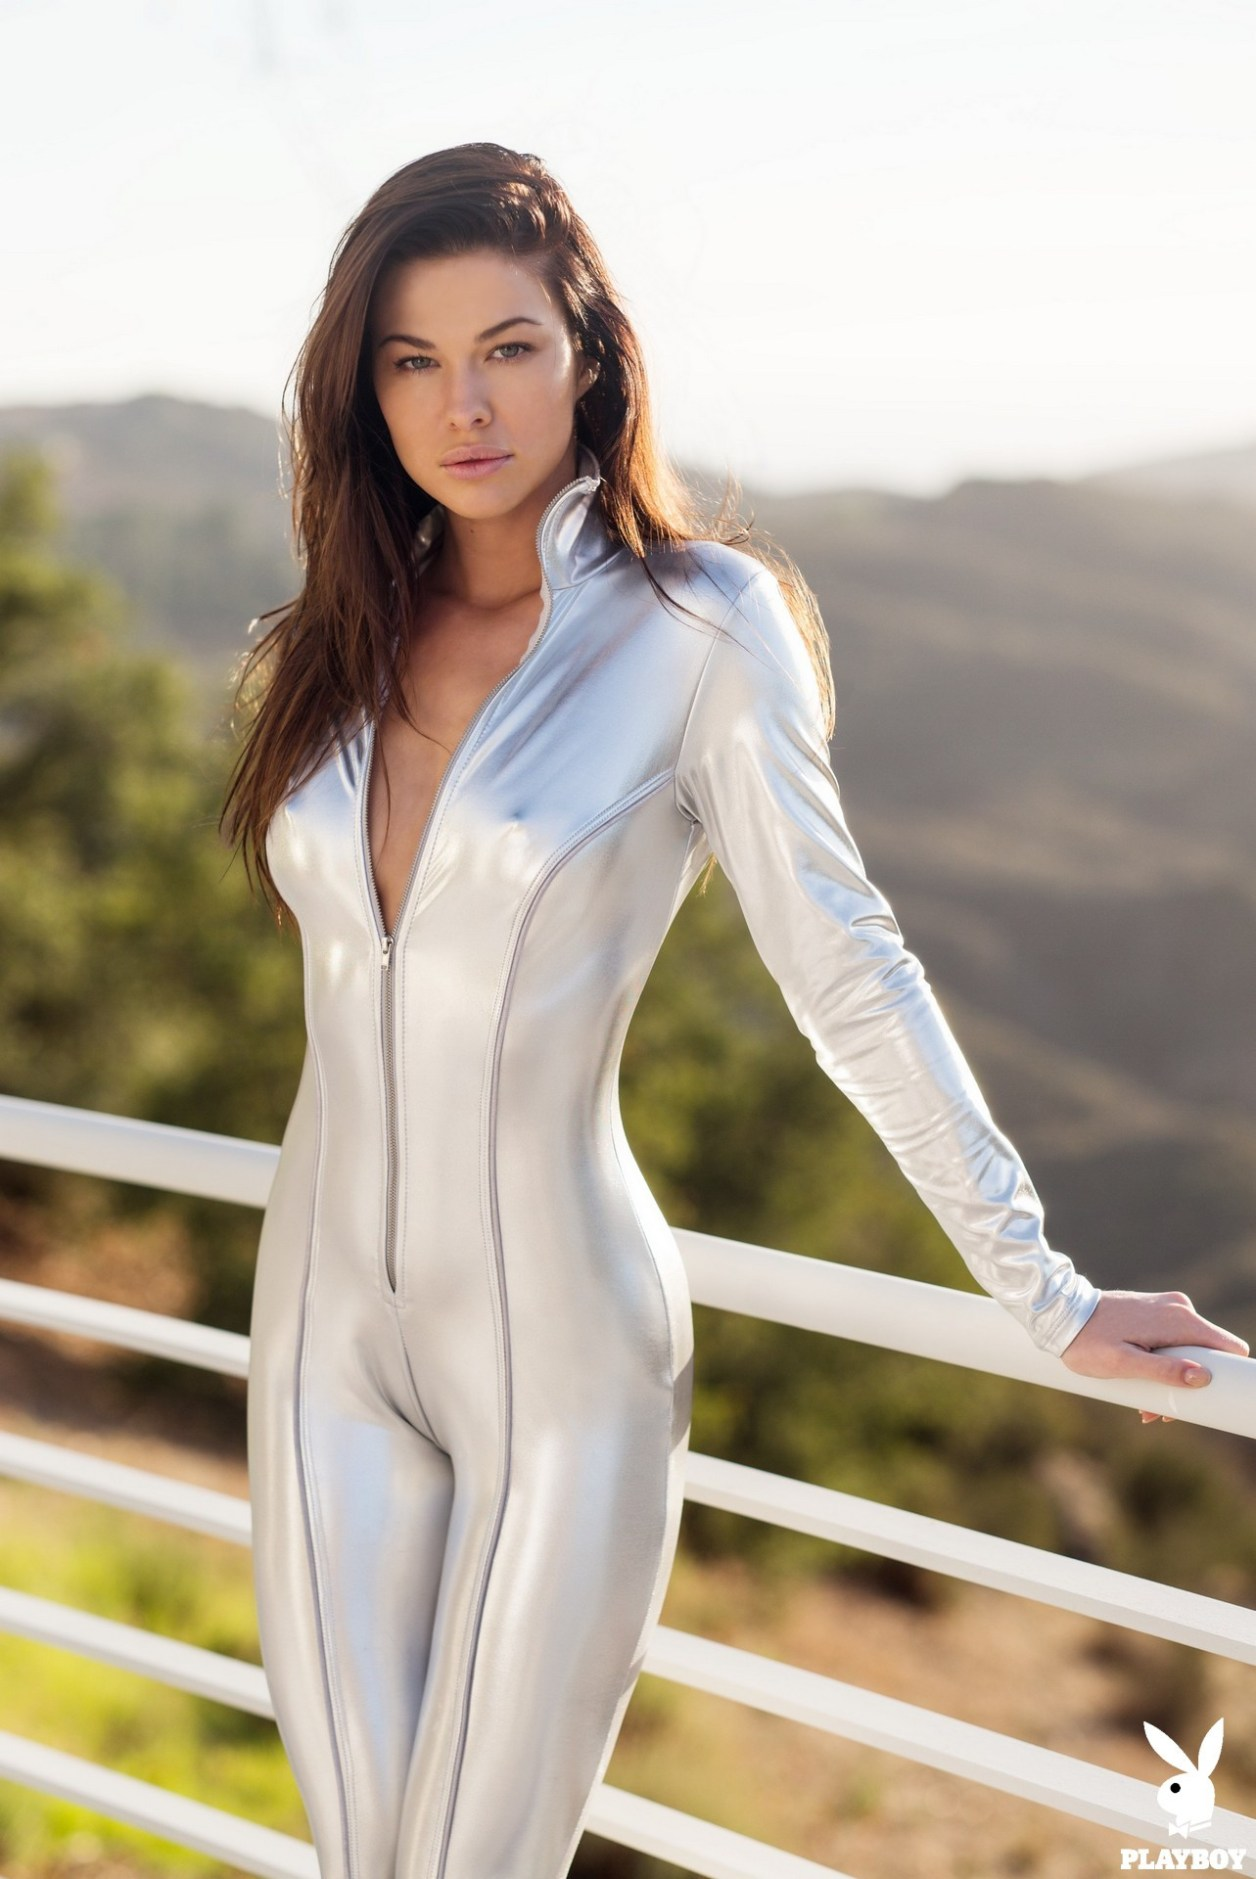 [Playboy plus] Jenny Watwood Playmate March 2018 JWatwoodpm-0014